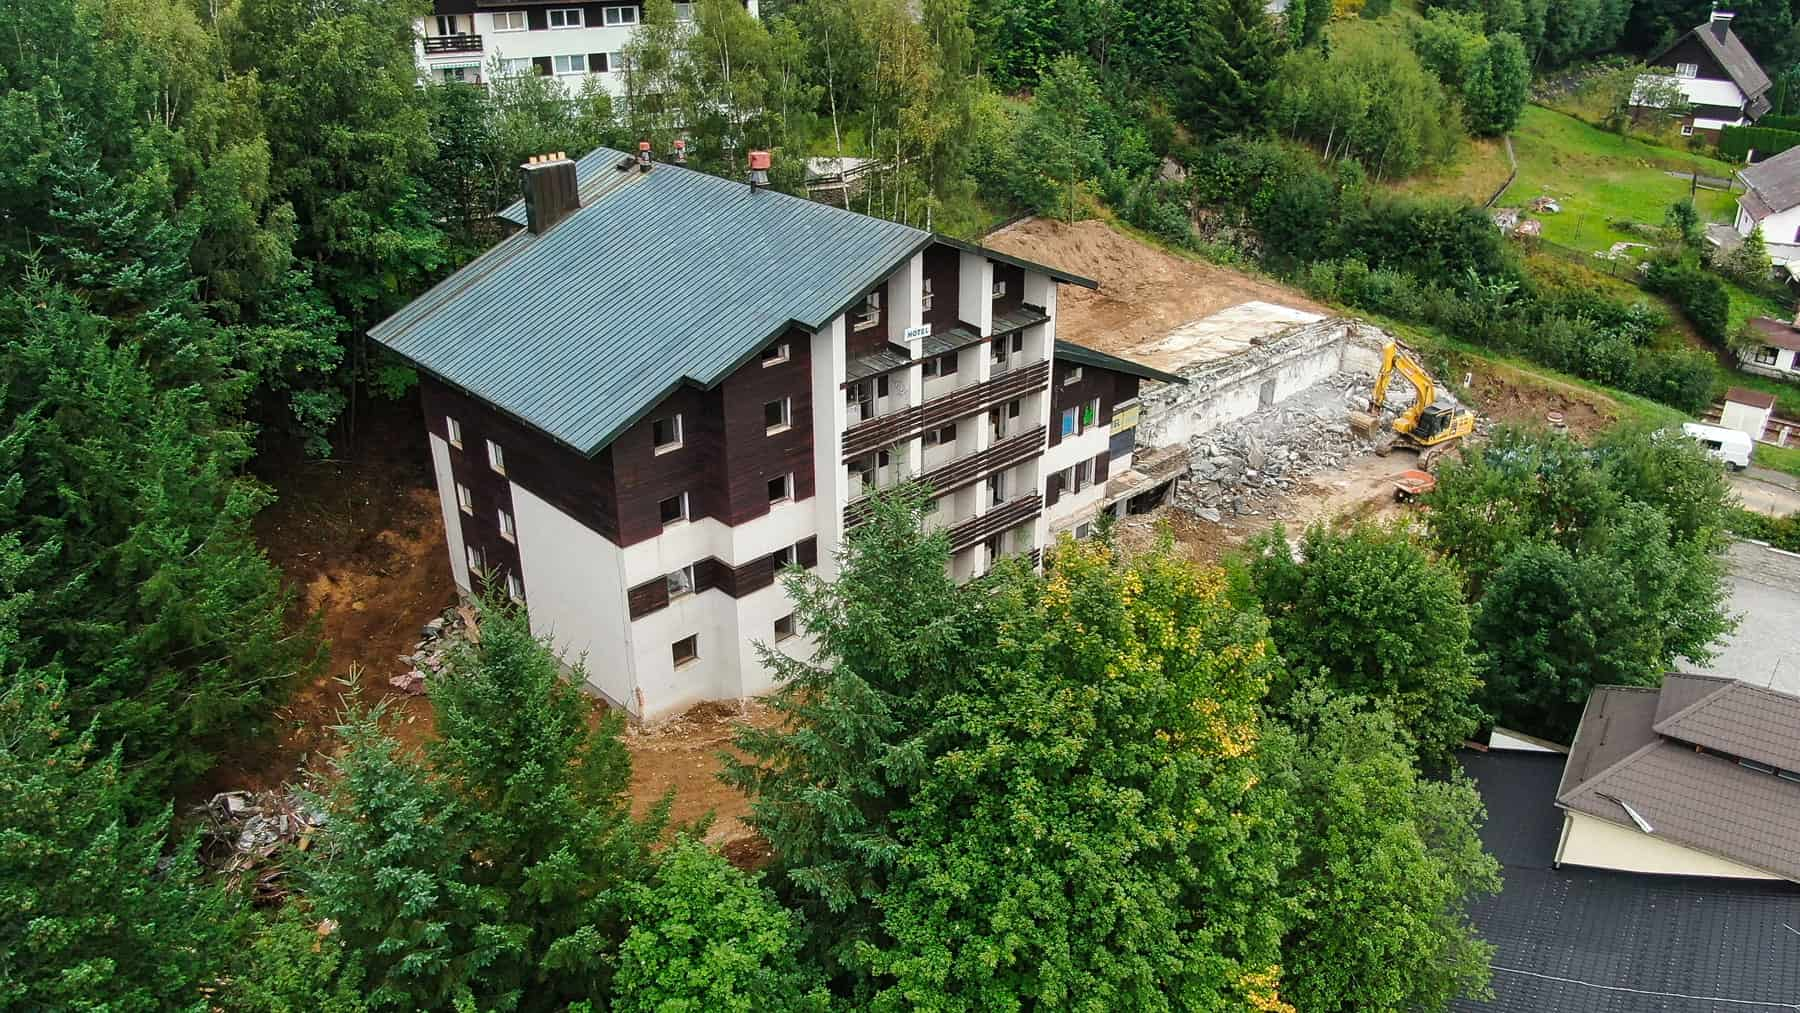 Rezidence Skalka Zelezna Ruda letecky pohled na stary hotel (2)